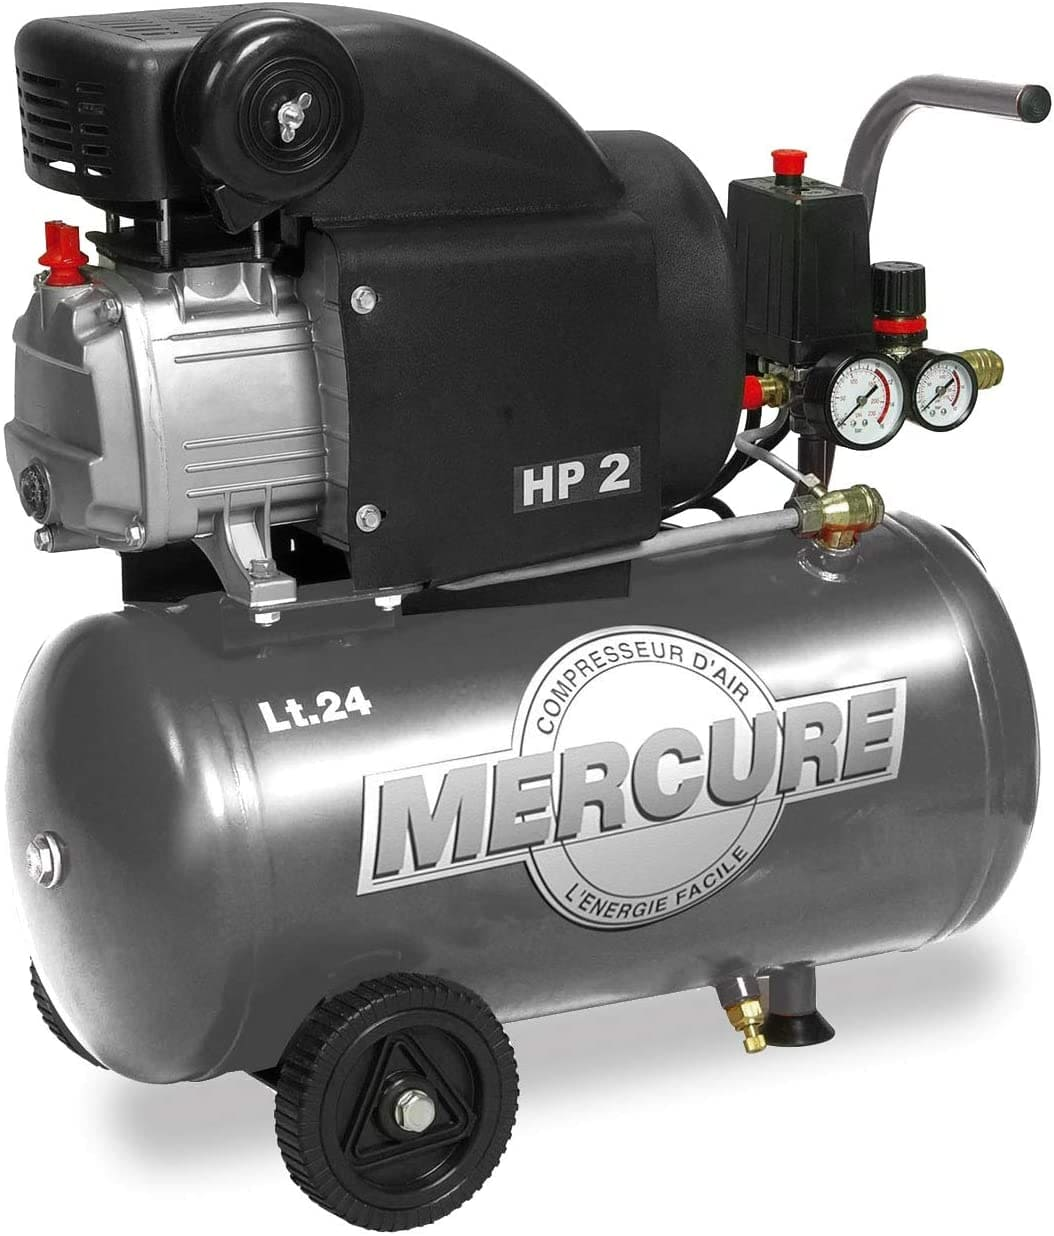 Mercure-425063-Compresor-de-Aire-1500-W-230-V-Gris